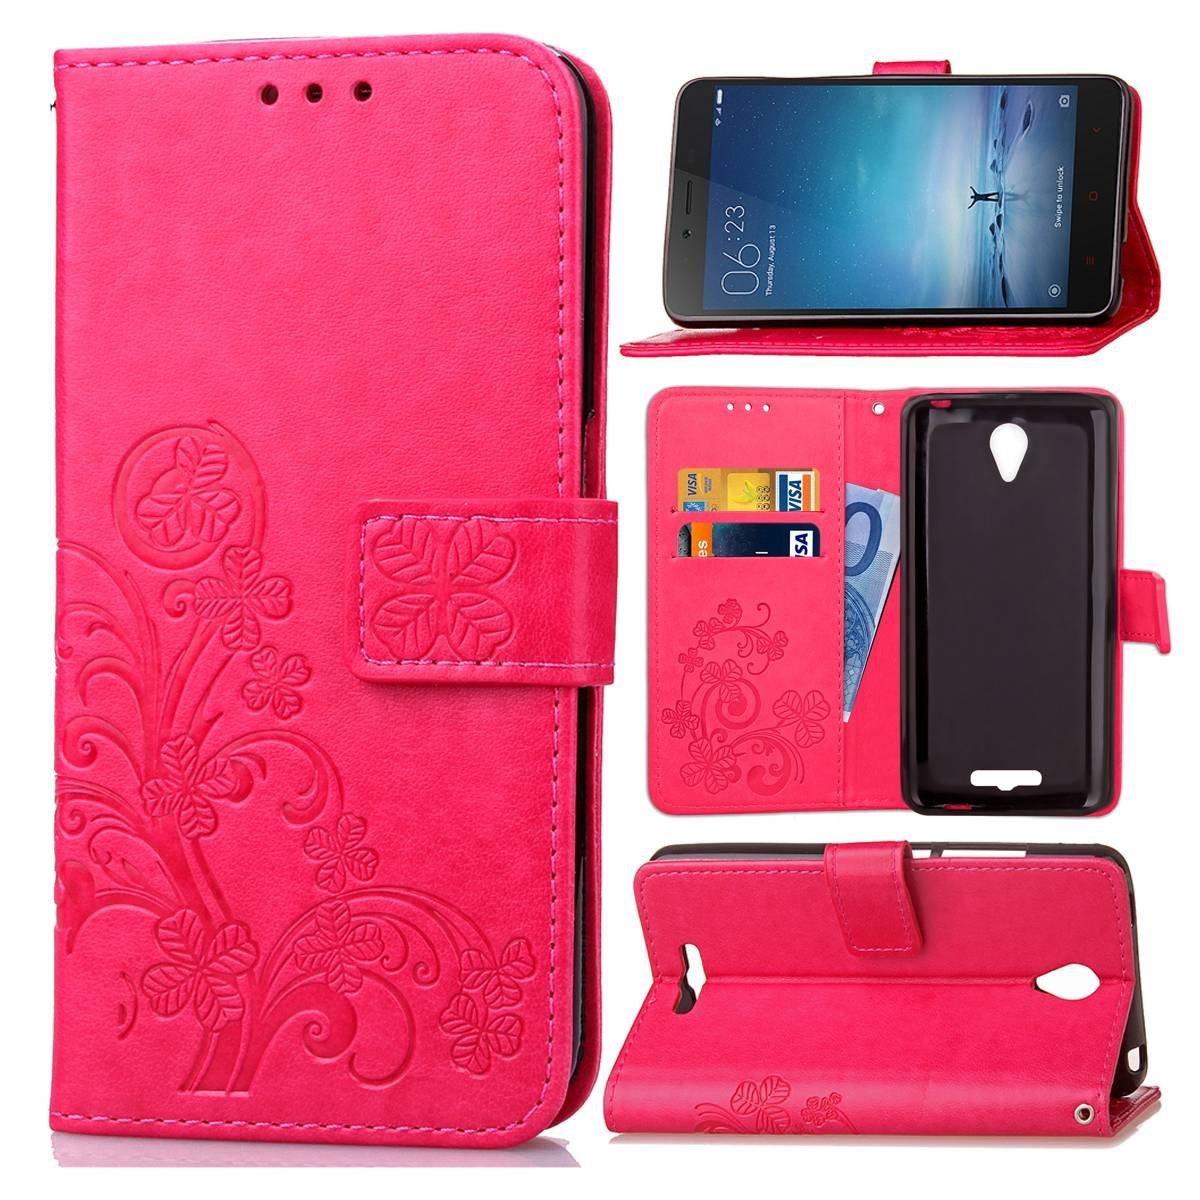 Guran Funda de Cuero PU para Xiaomi Redmi Note 2 Smartphone ...